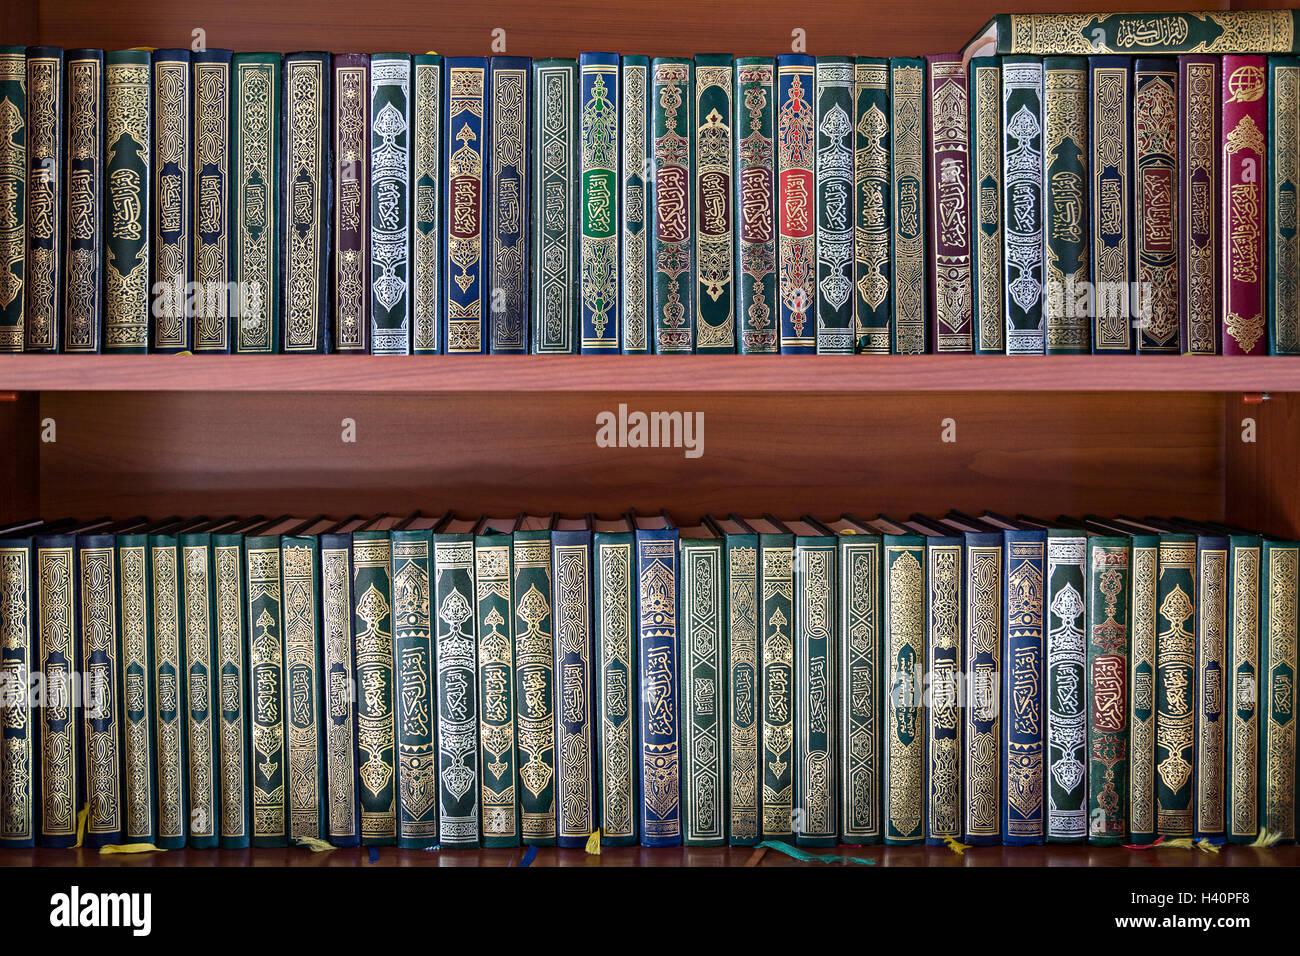 Religious books. - Stock Image